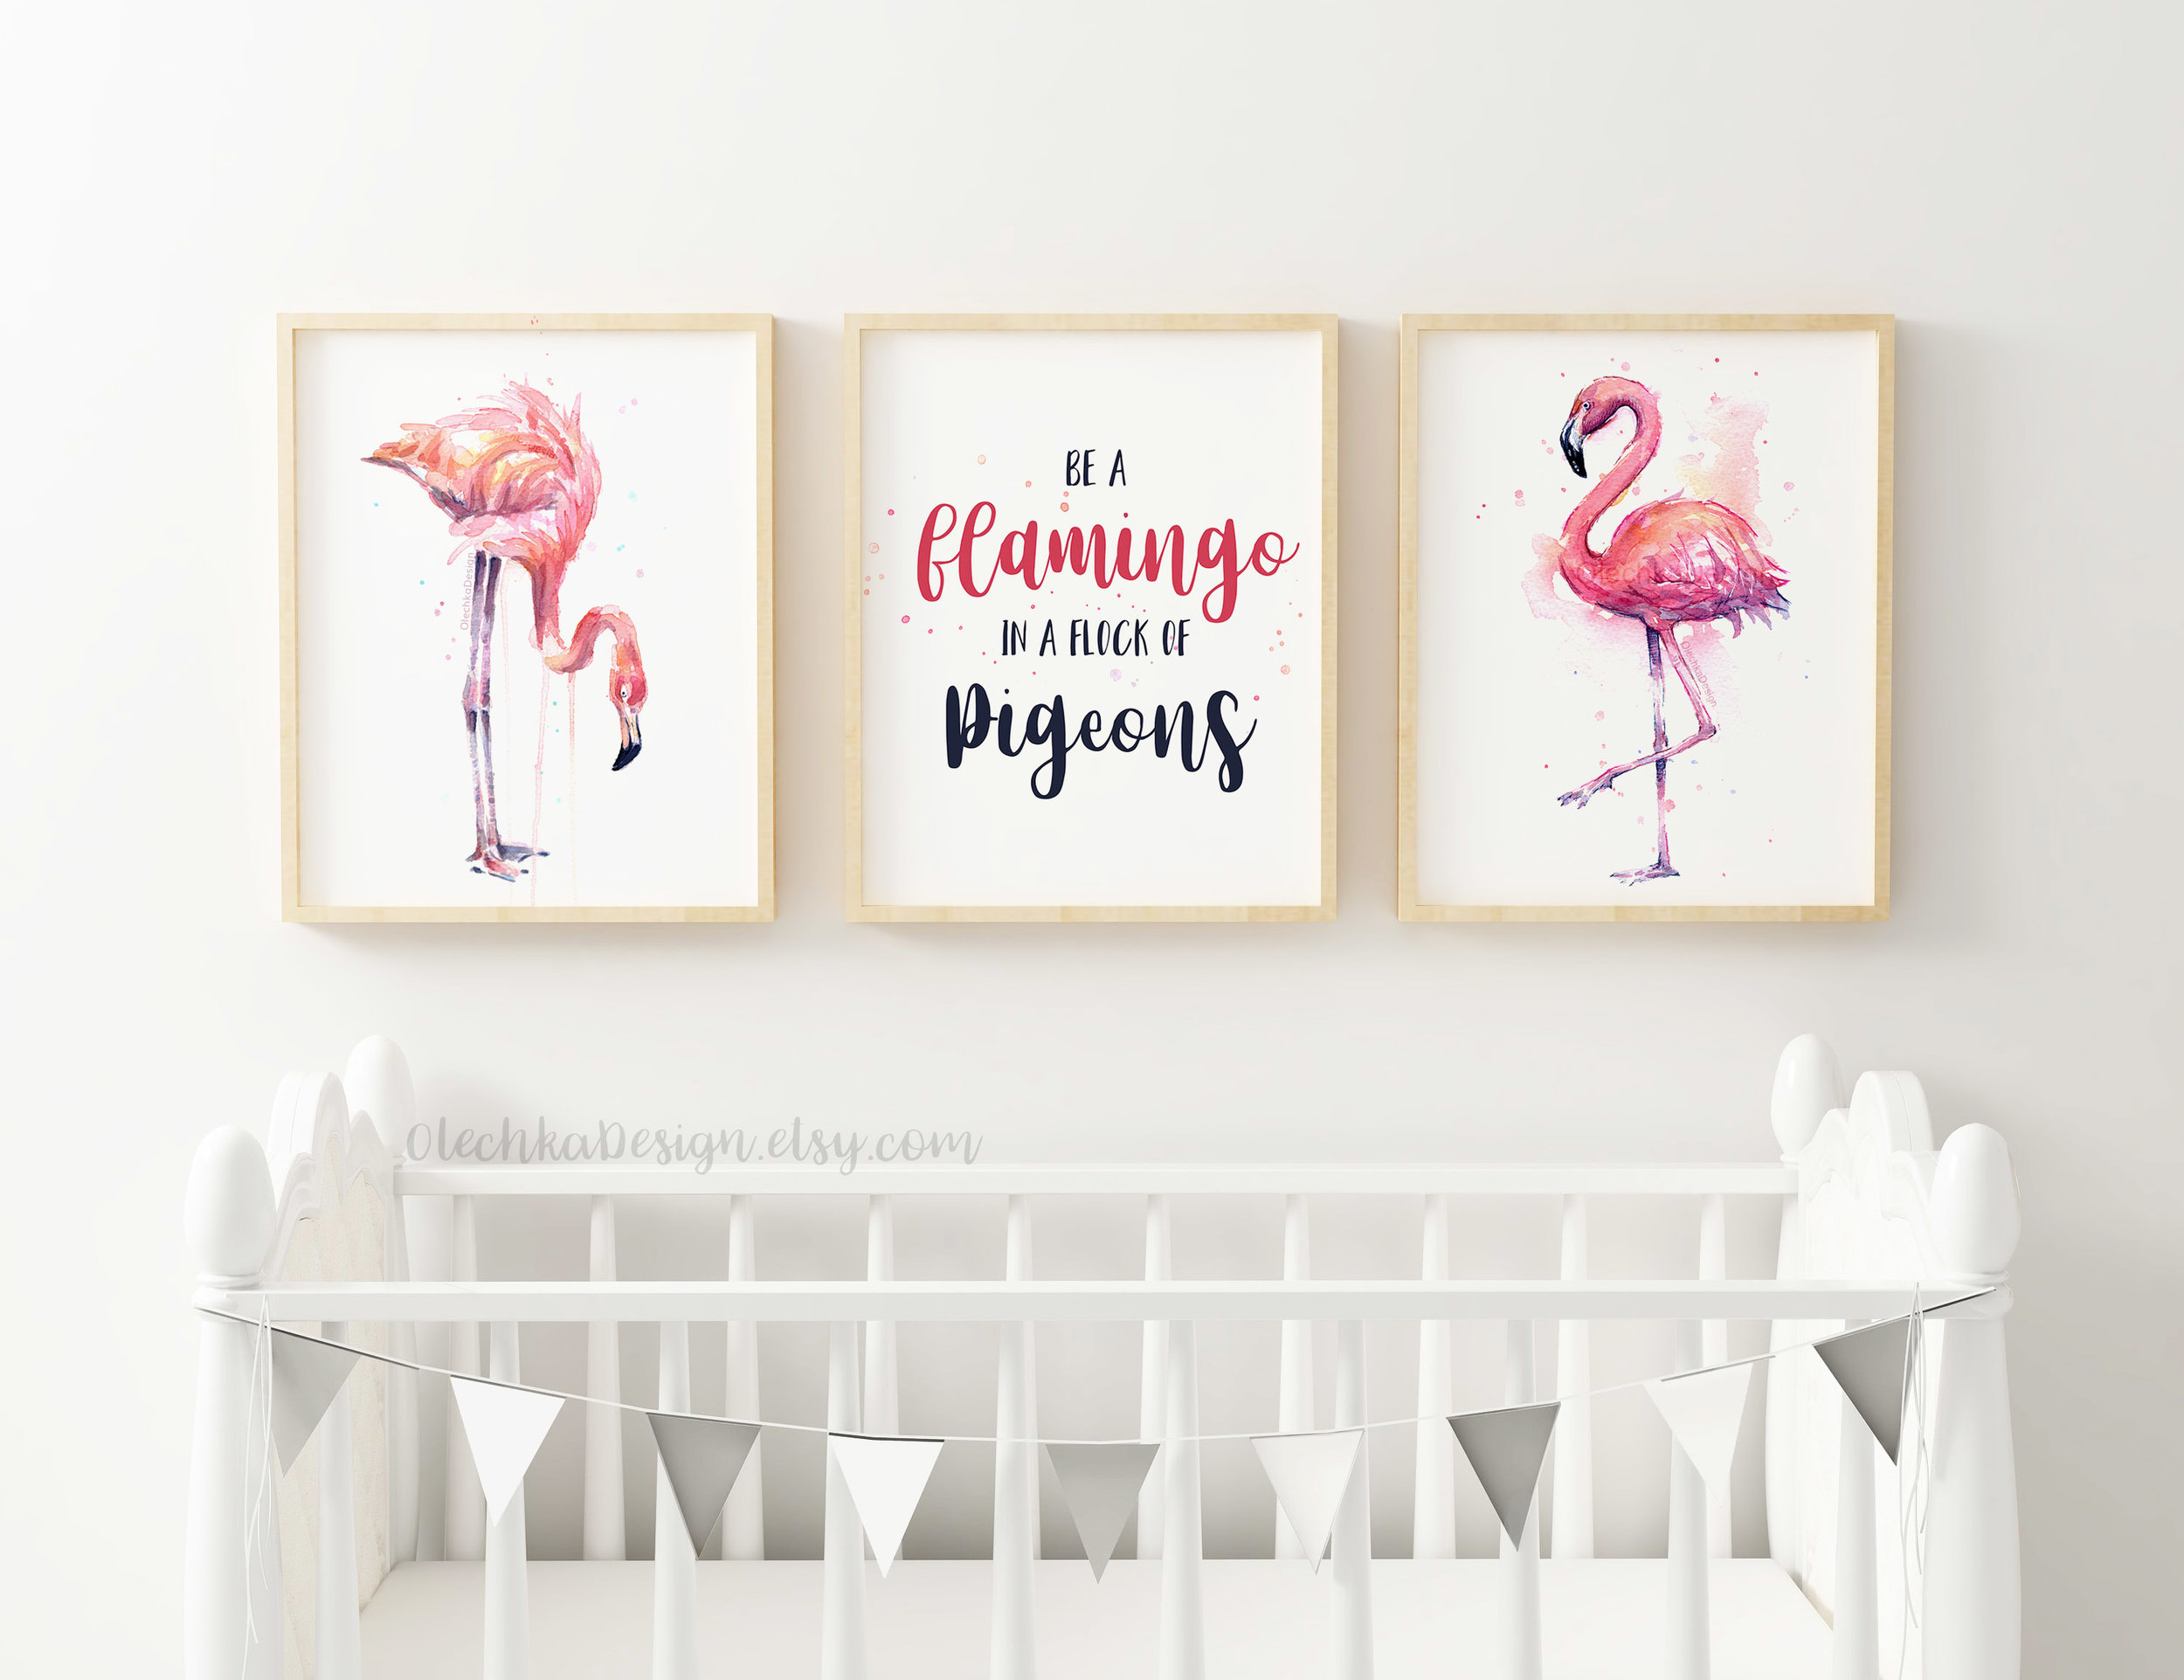 flamingo-wall-art-flamingo-prints-be-a-flamingo.jpg